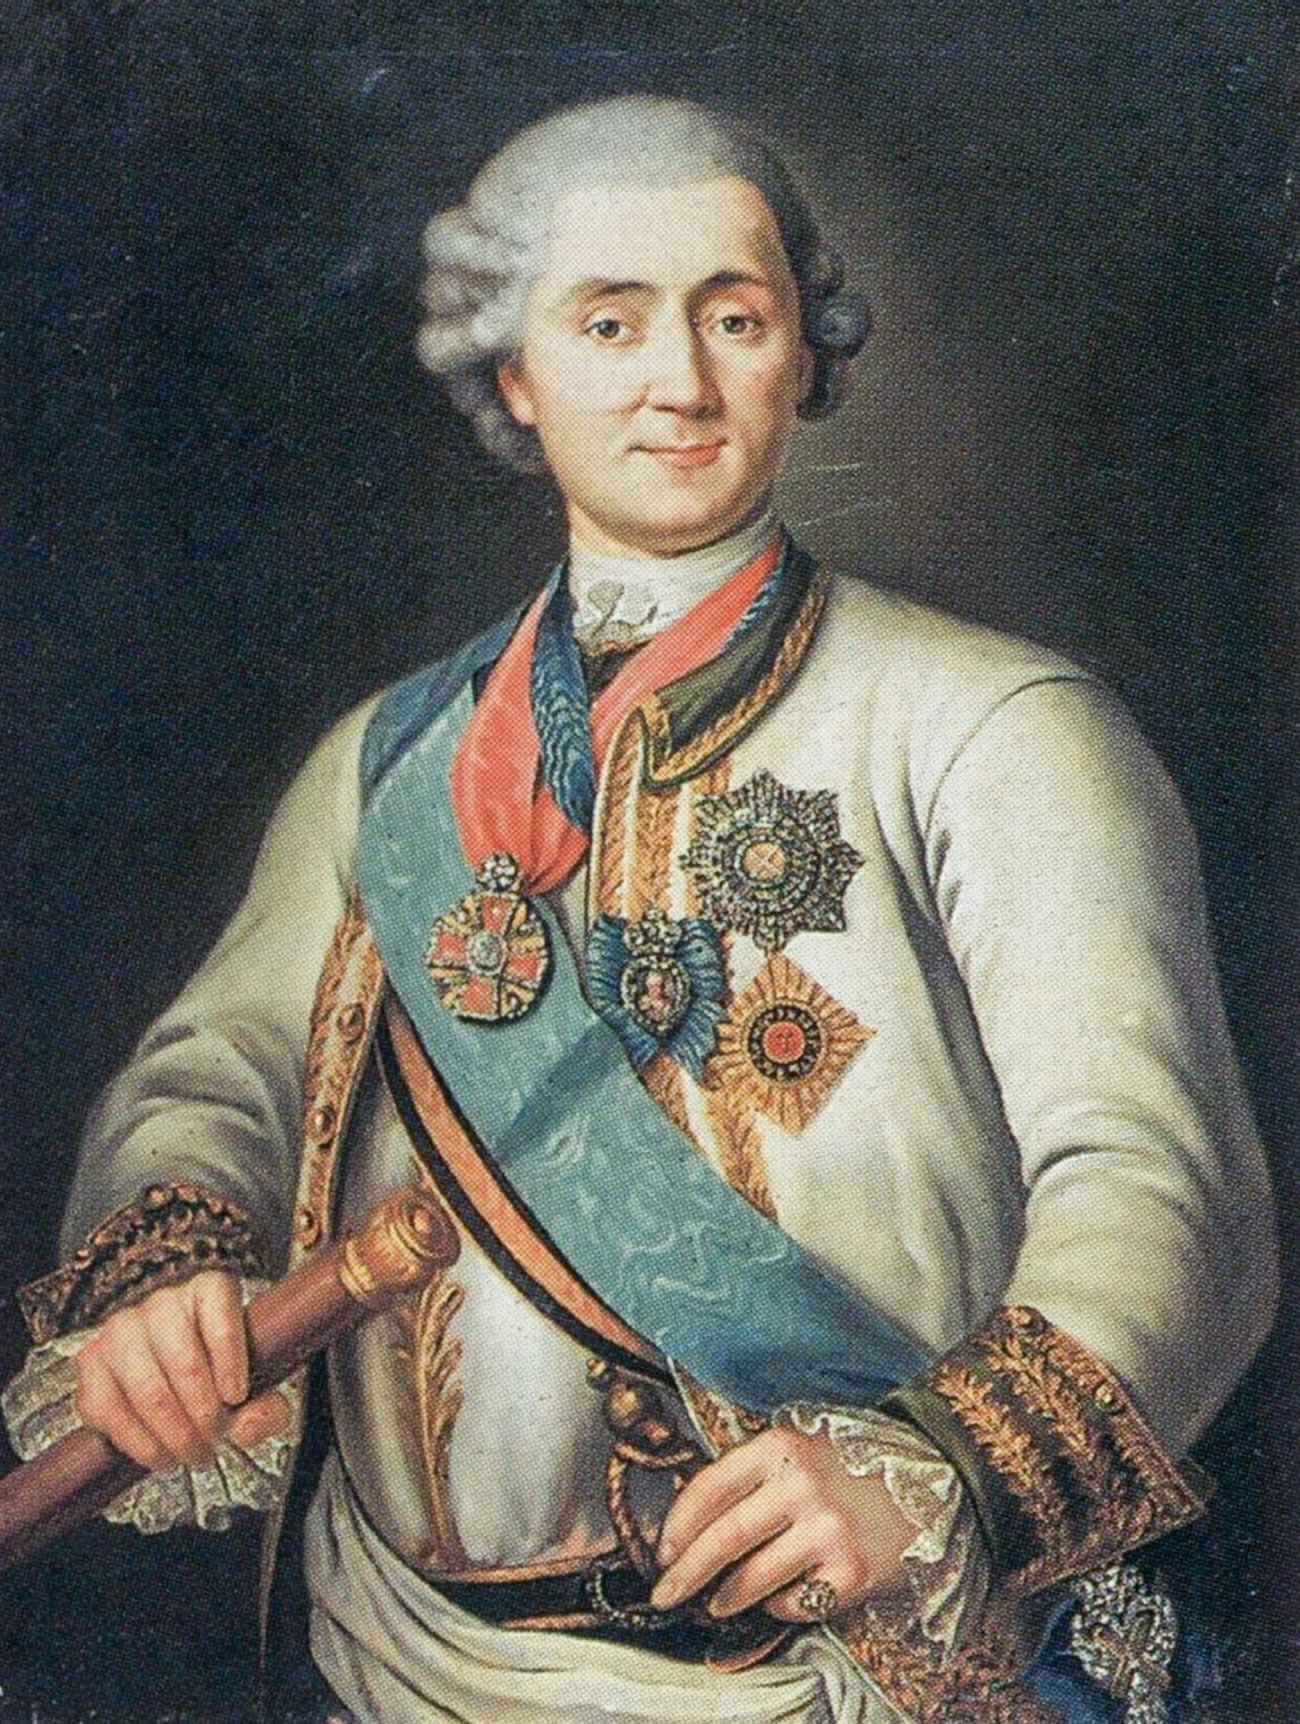 Portrait of Count Alexei Grigoryevich Orlov.